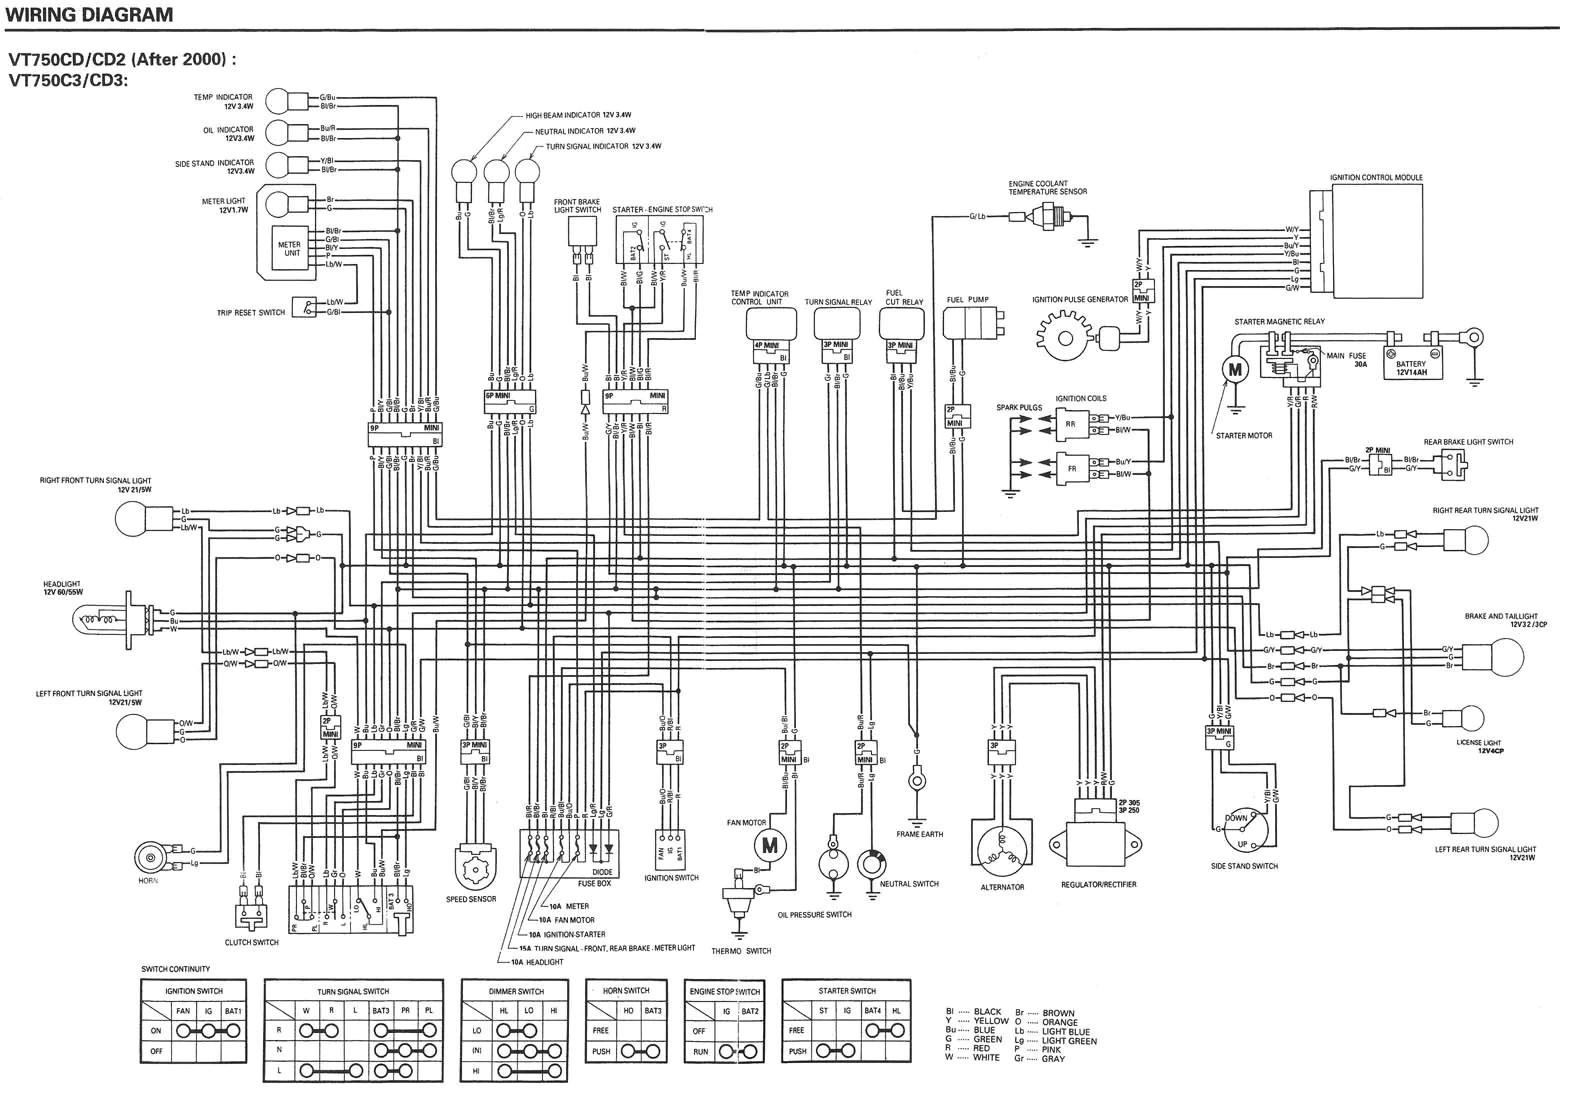 john deere sabre 1438gs wiring diagram single pole switch with pilot light all data schematic harness 2000 honda xr650l